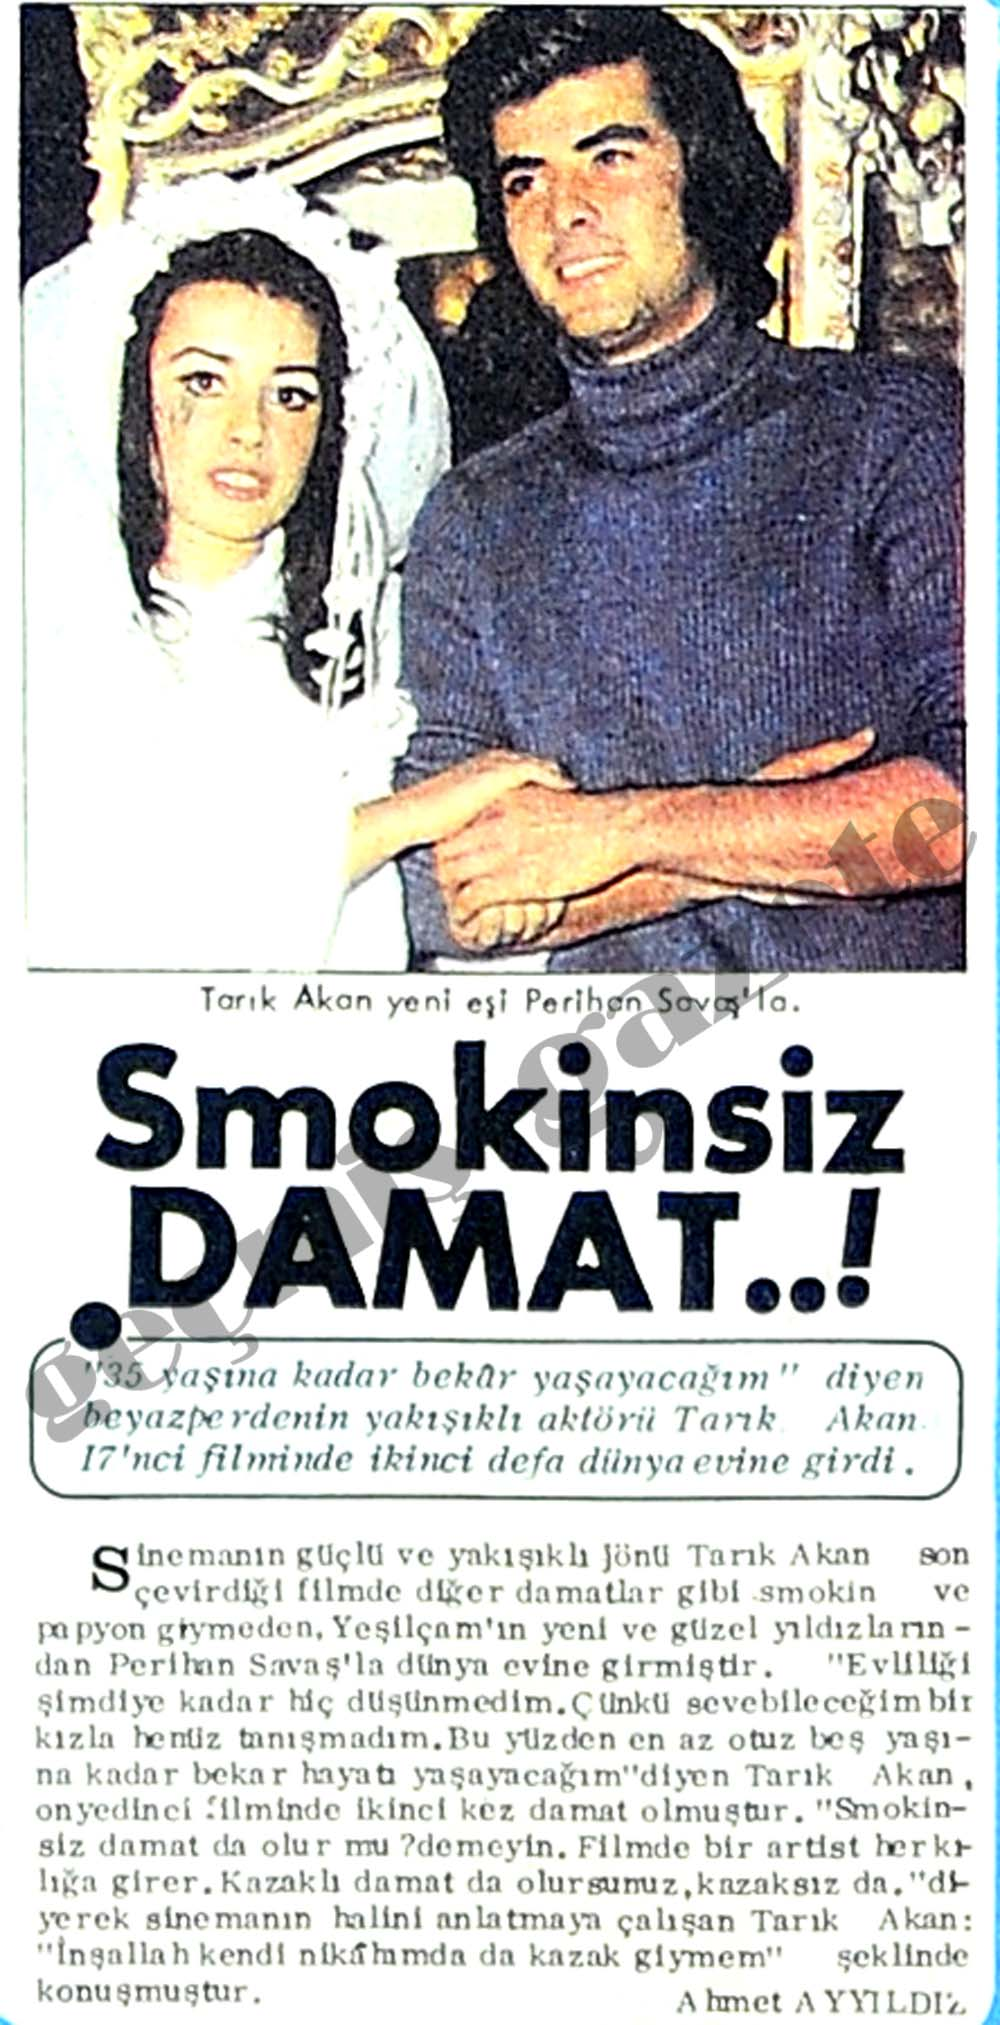 Smokinsiz DAMAT!